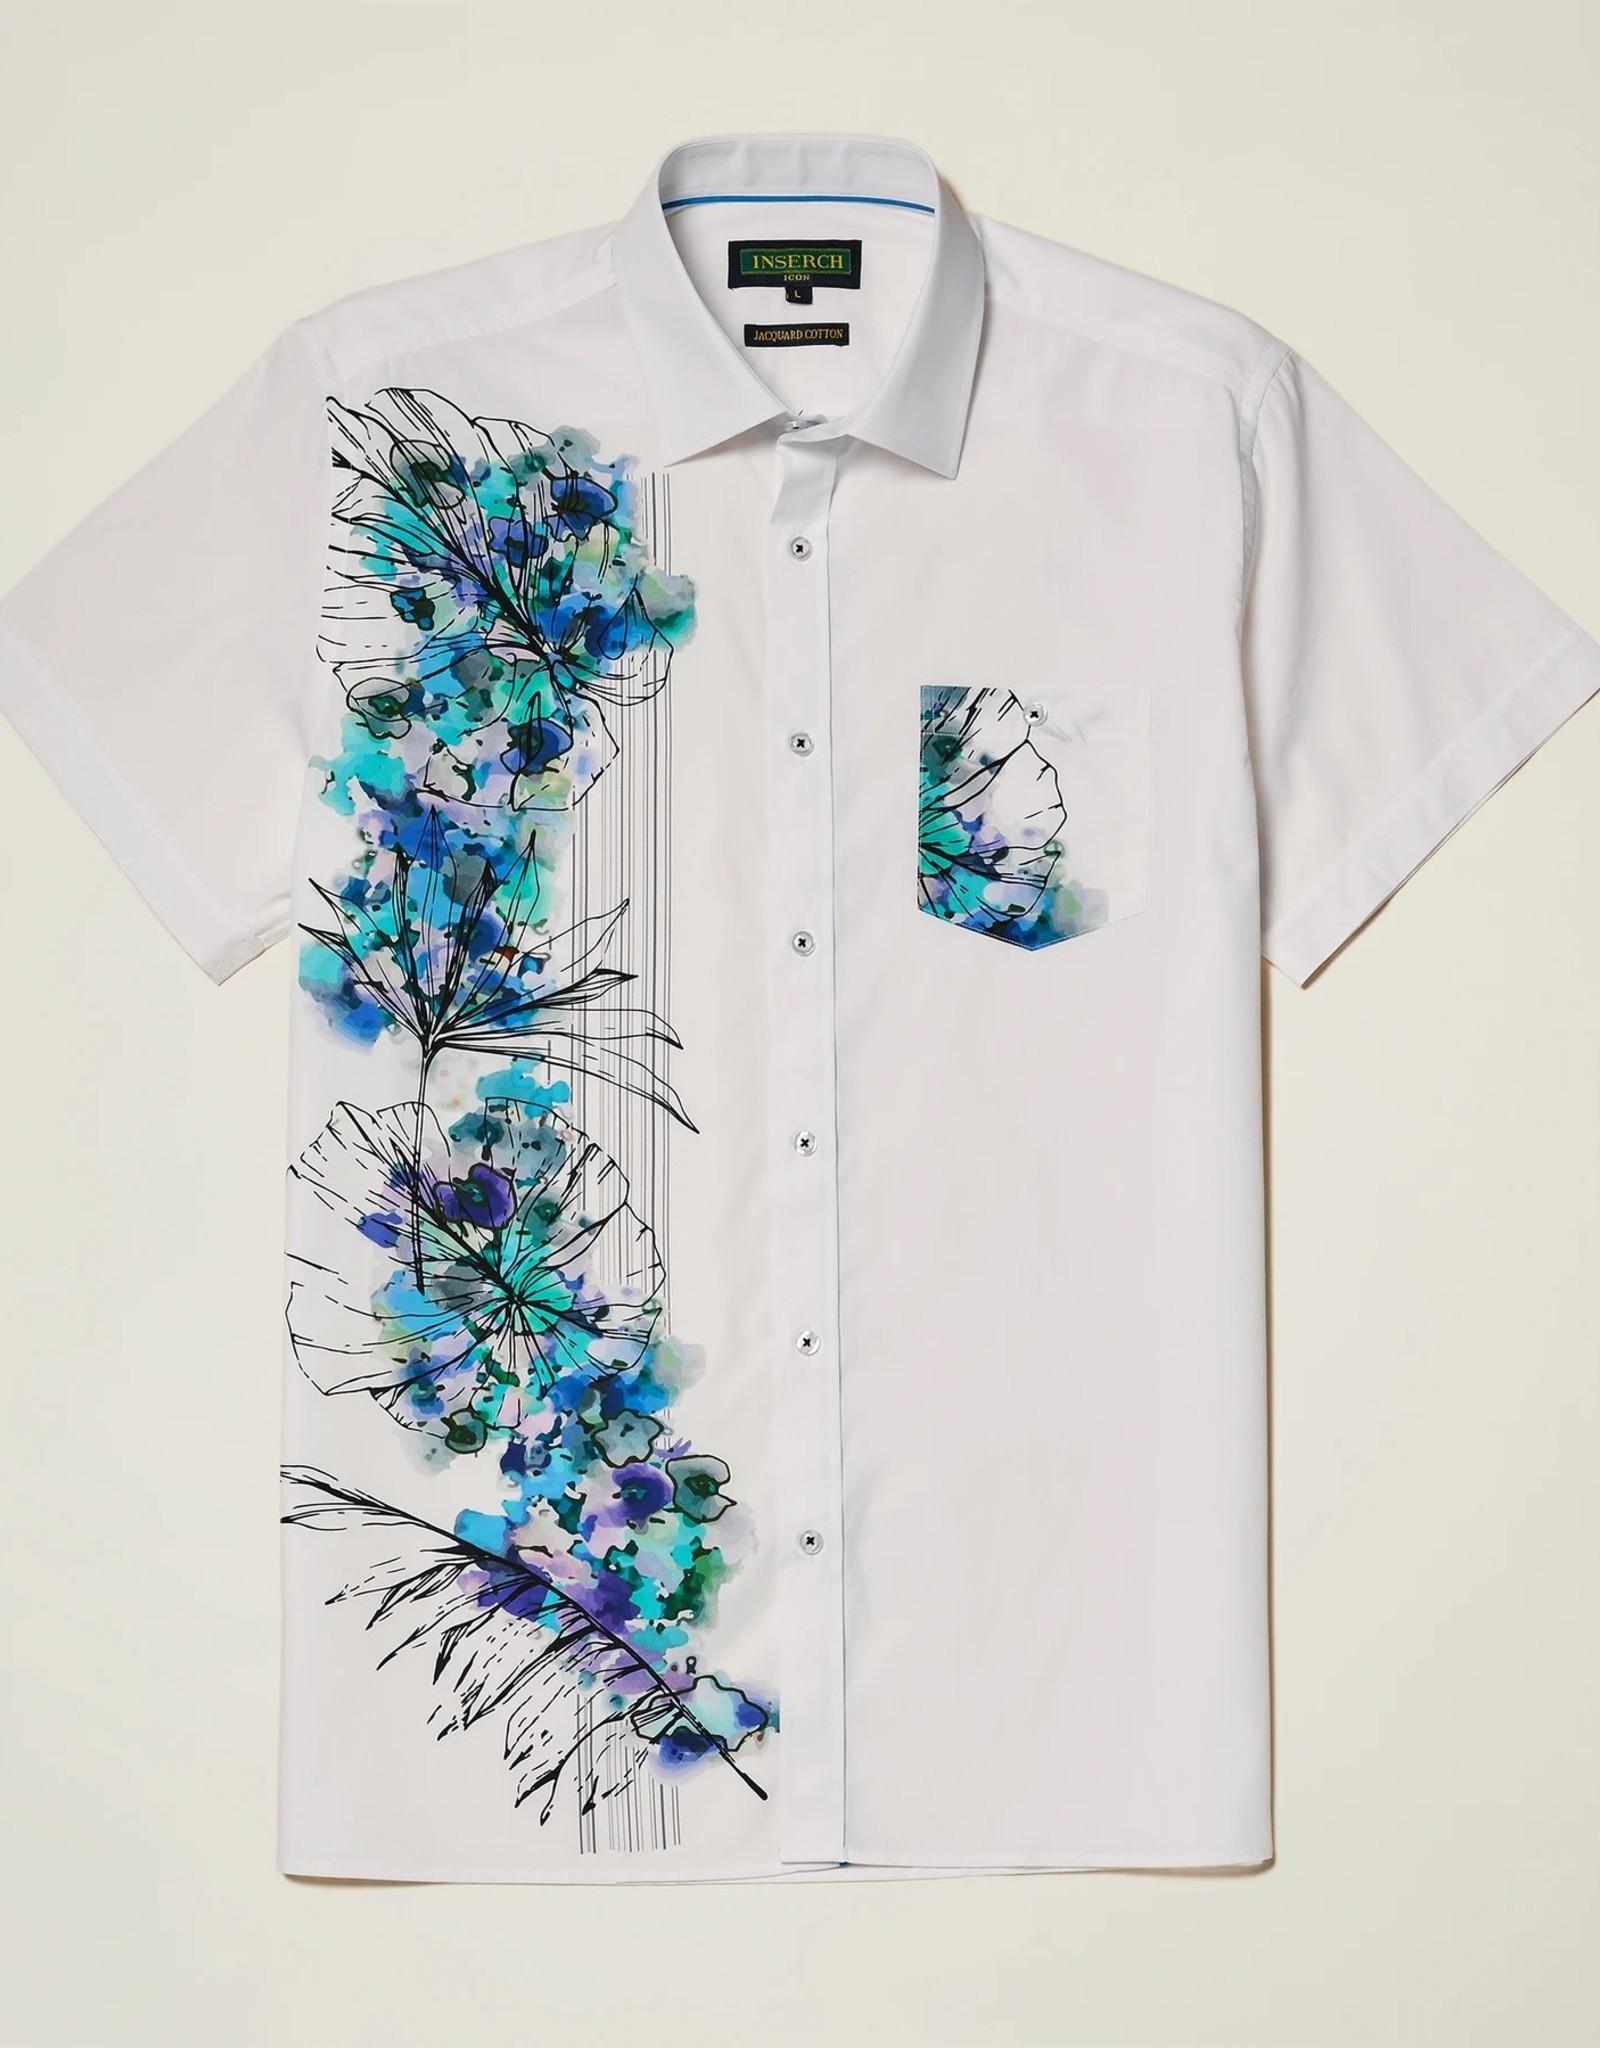 INSERCH MERC USA Shirt Casual Short Sleeves Cotton ss004 White/Blue